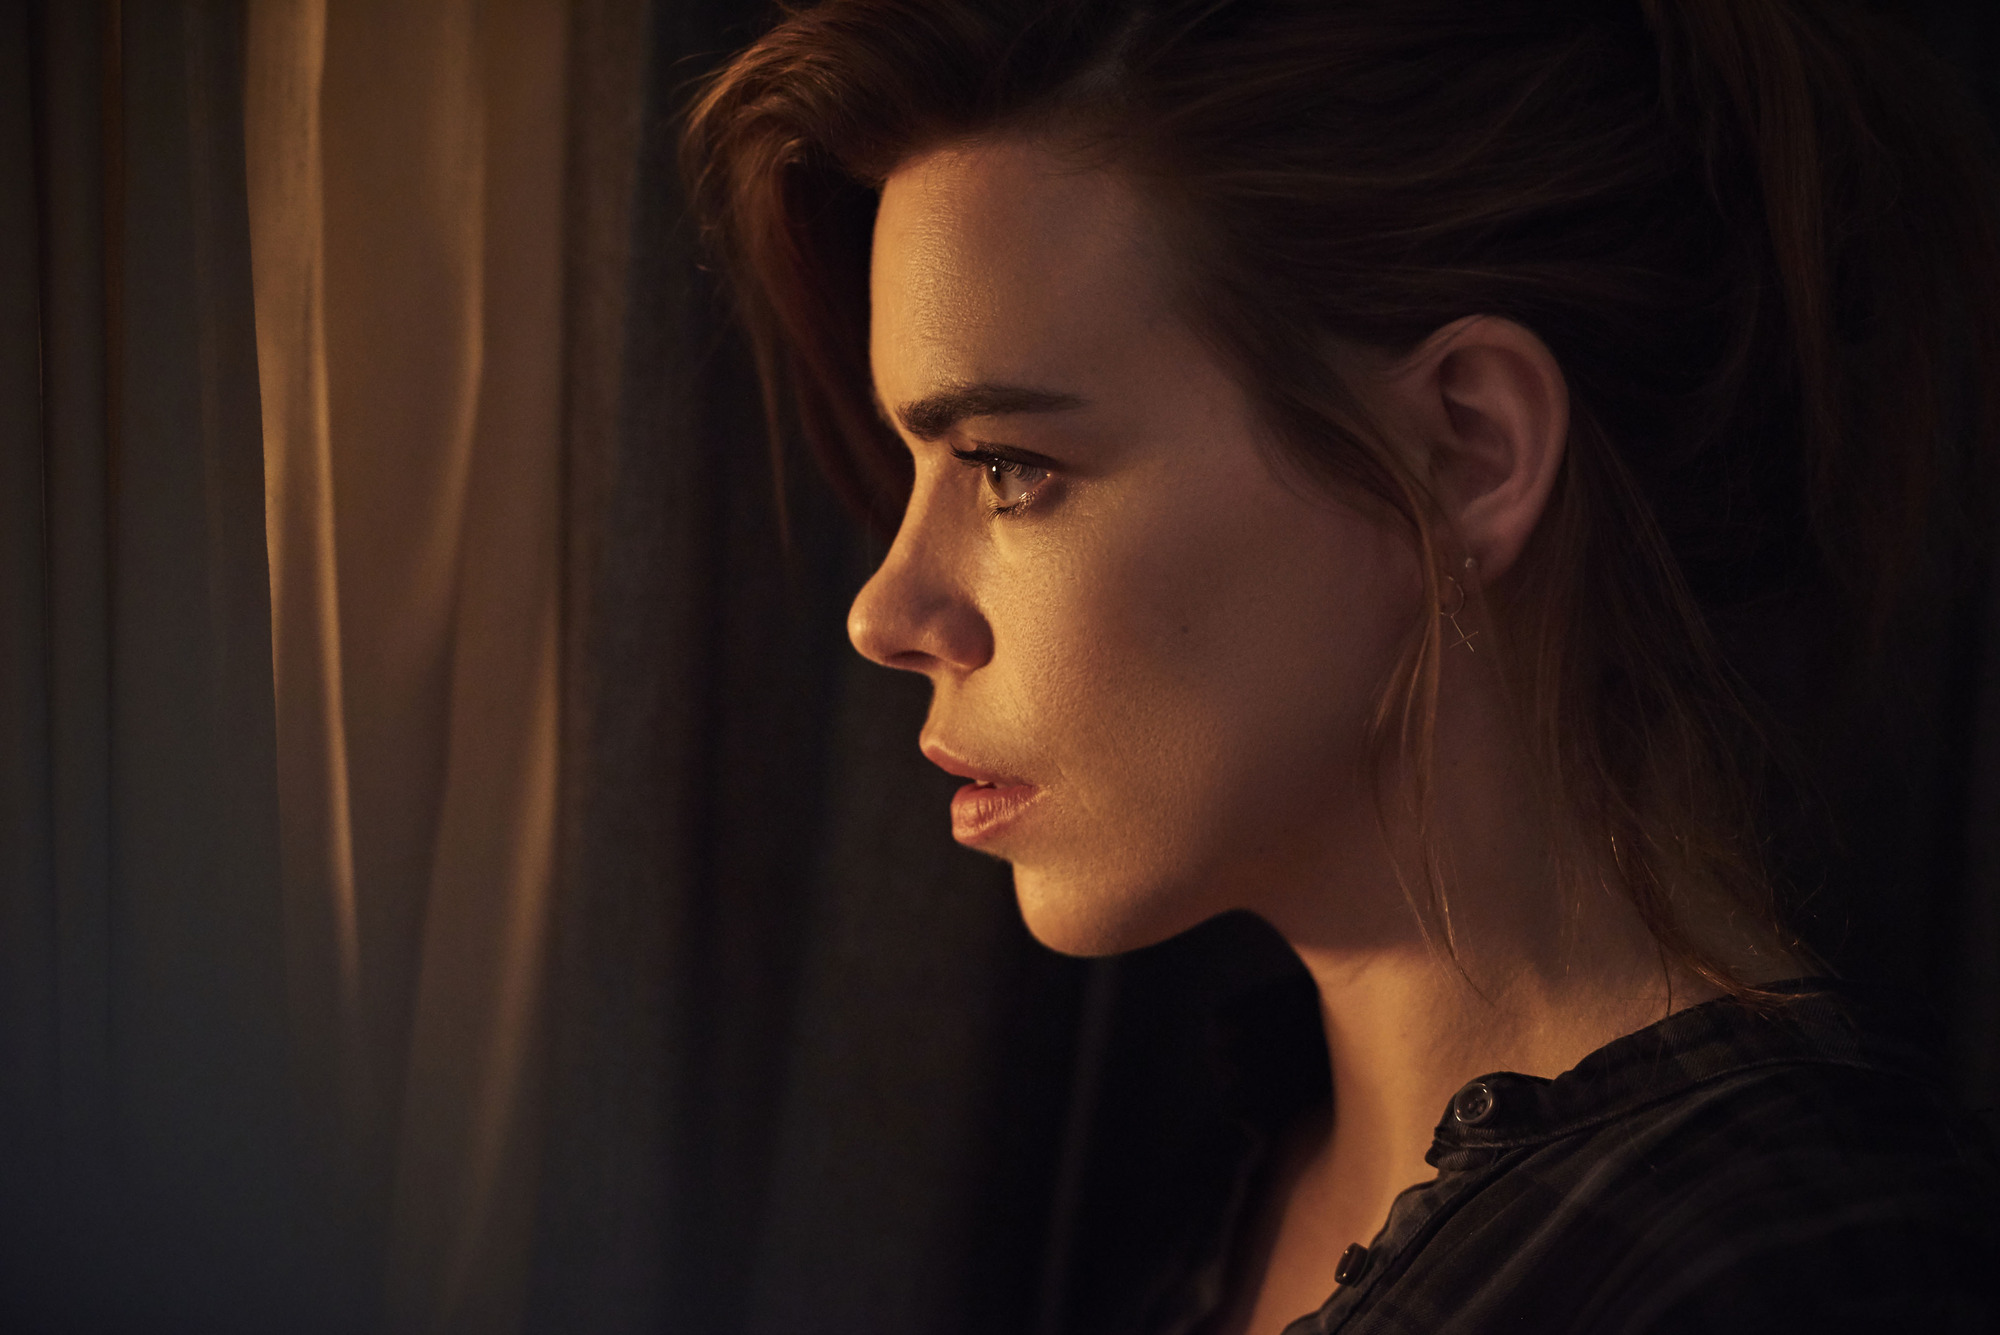 Collateral - Billie Piper as Karen Mars